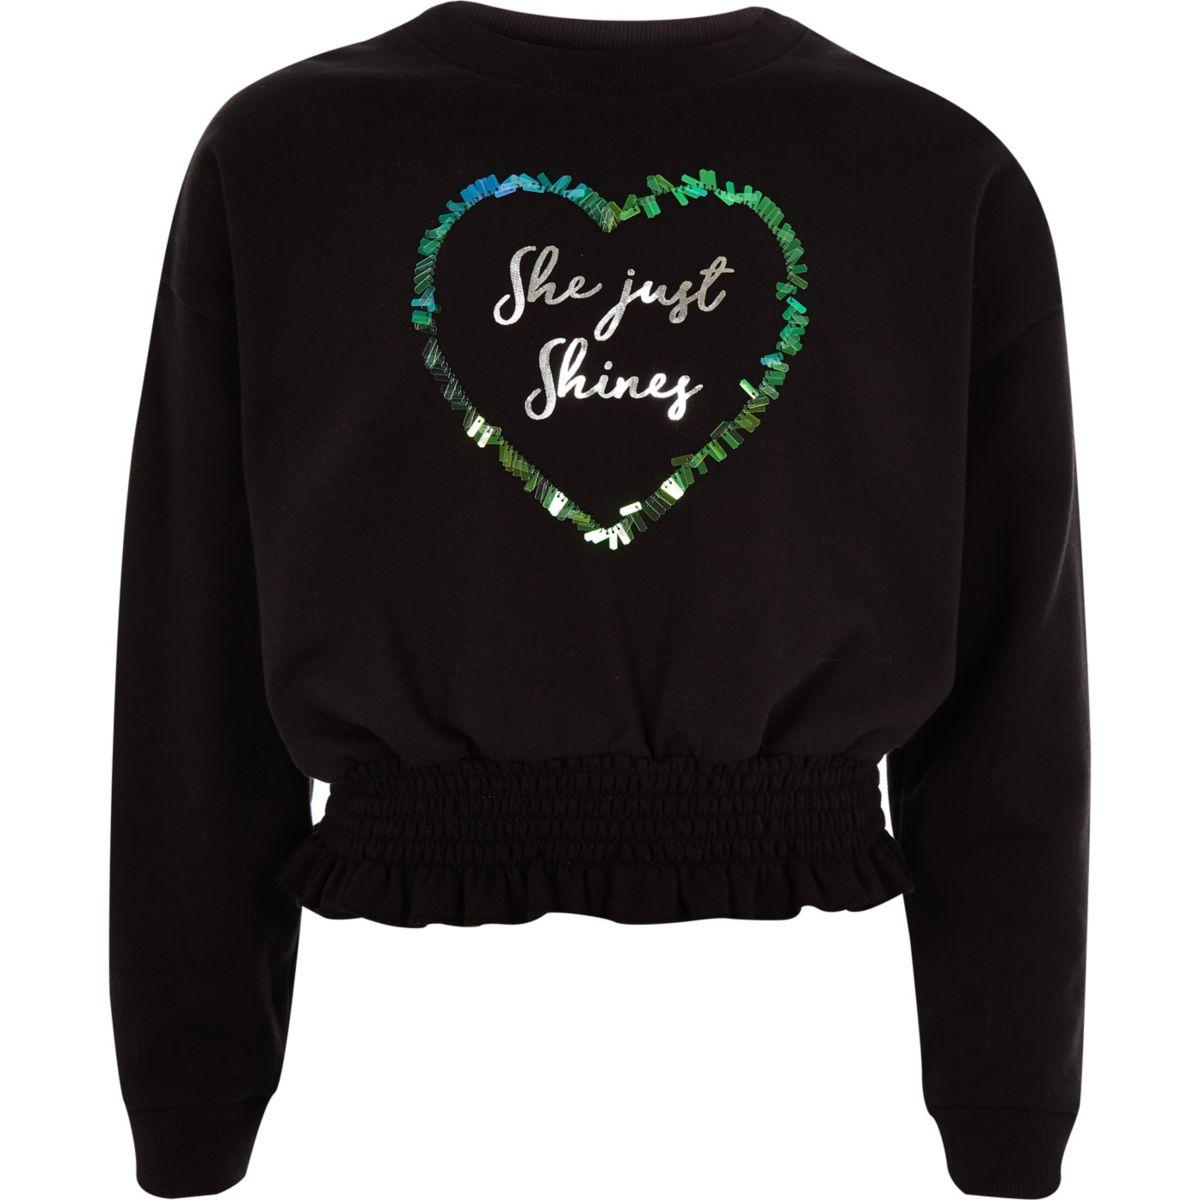 Girls black 'She just shines' sweatshirt